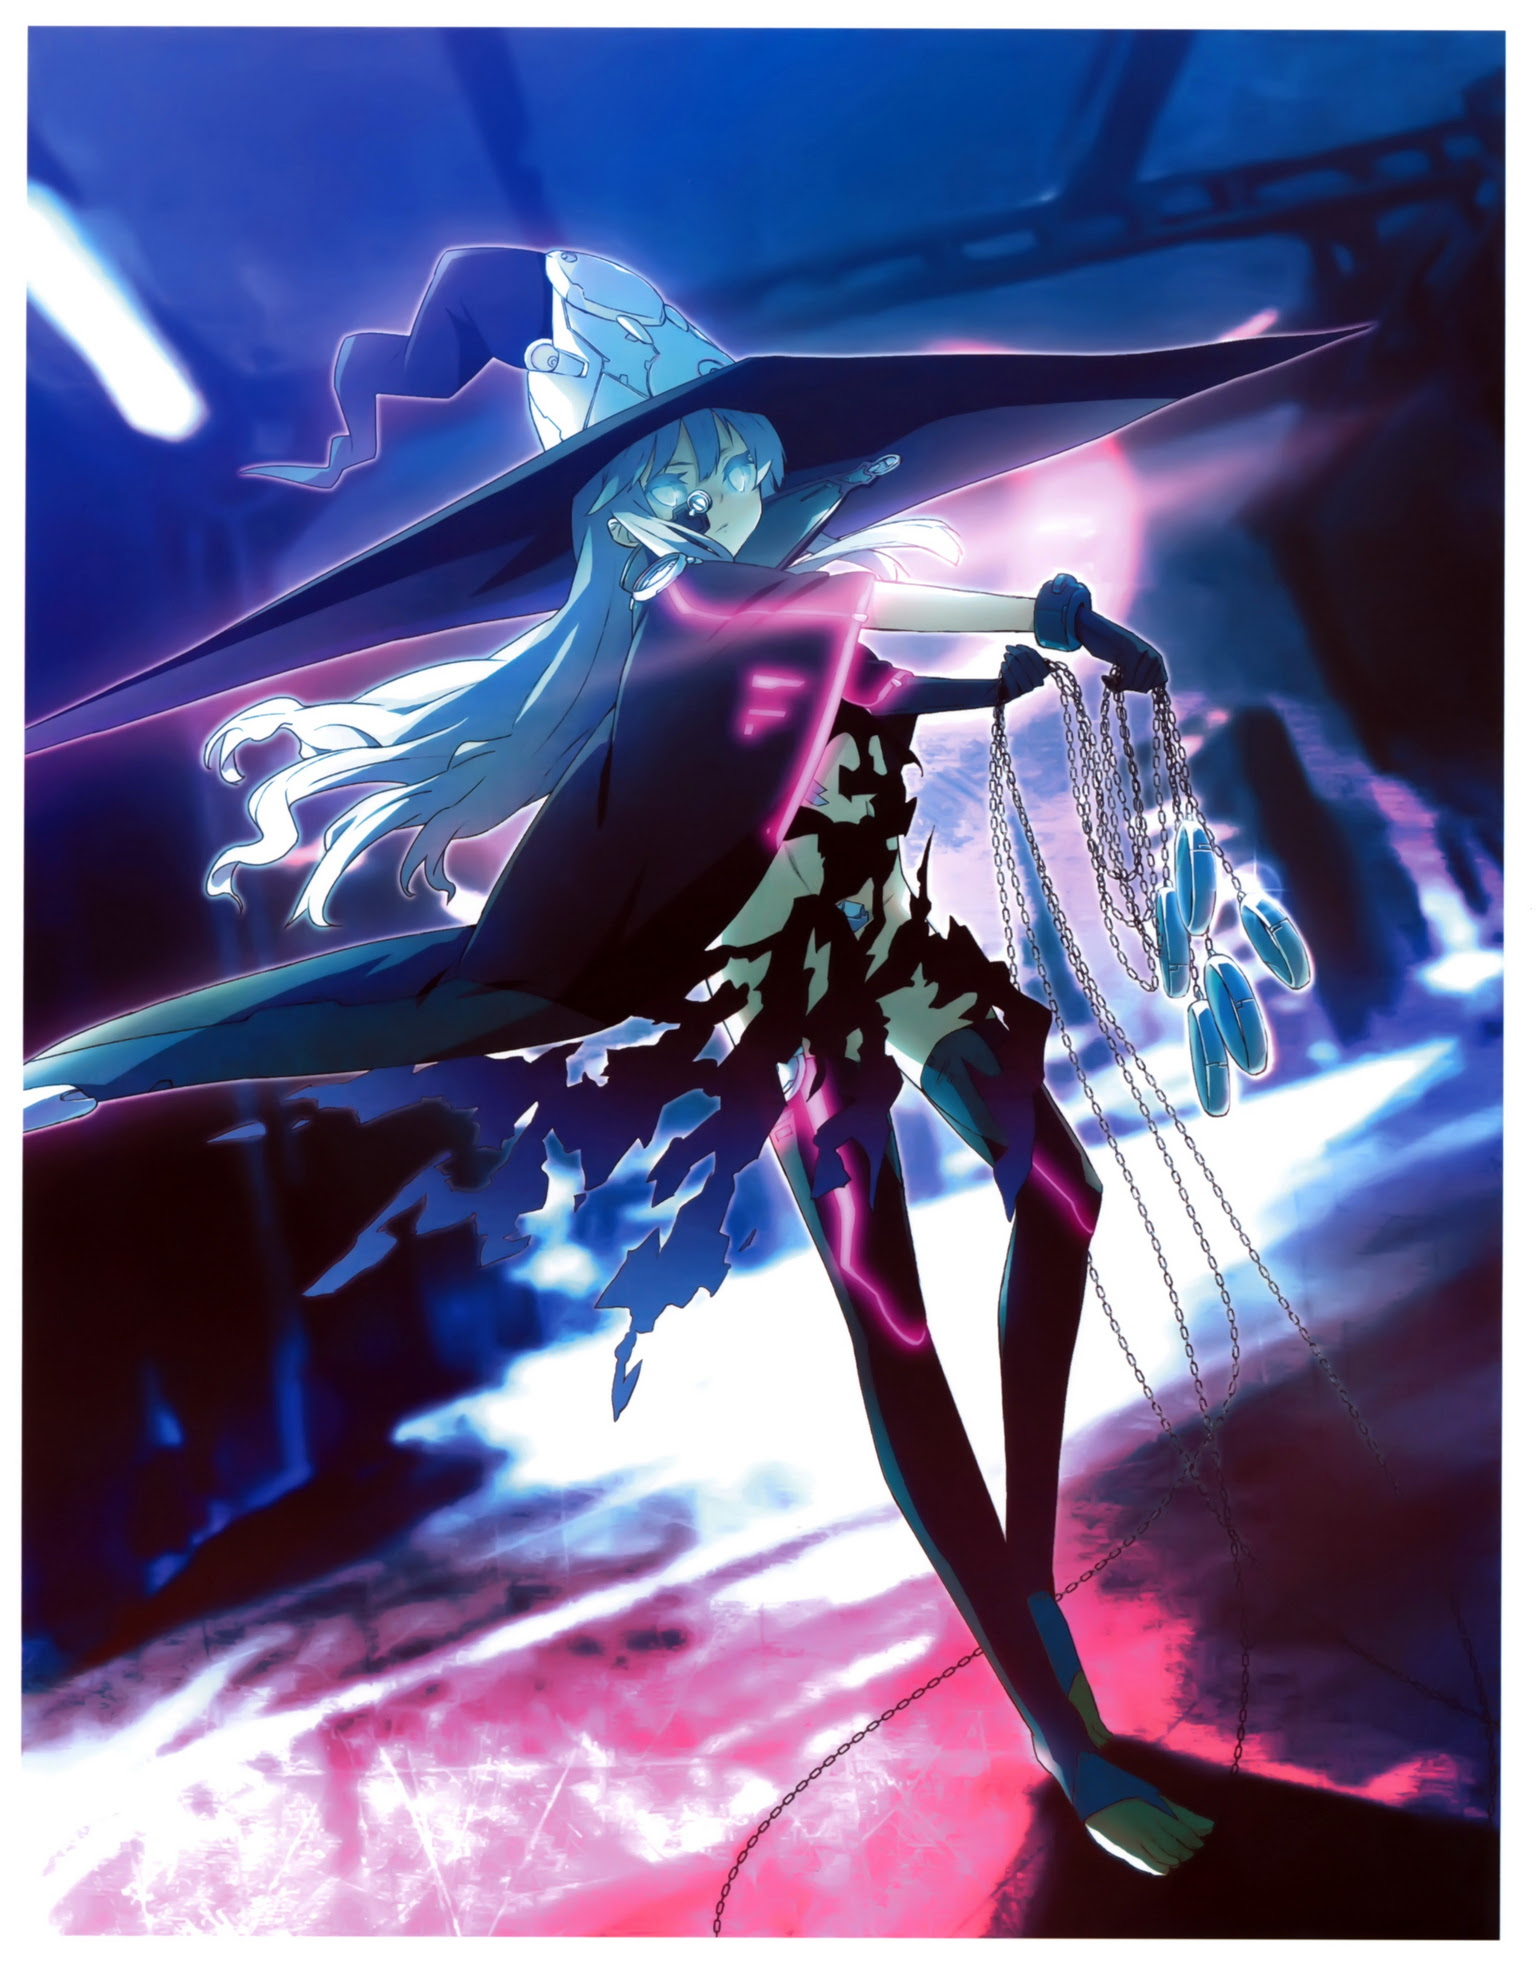 iPad Anime Wallpapers - WallpaperSafari